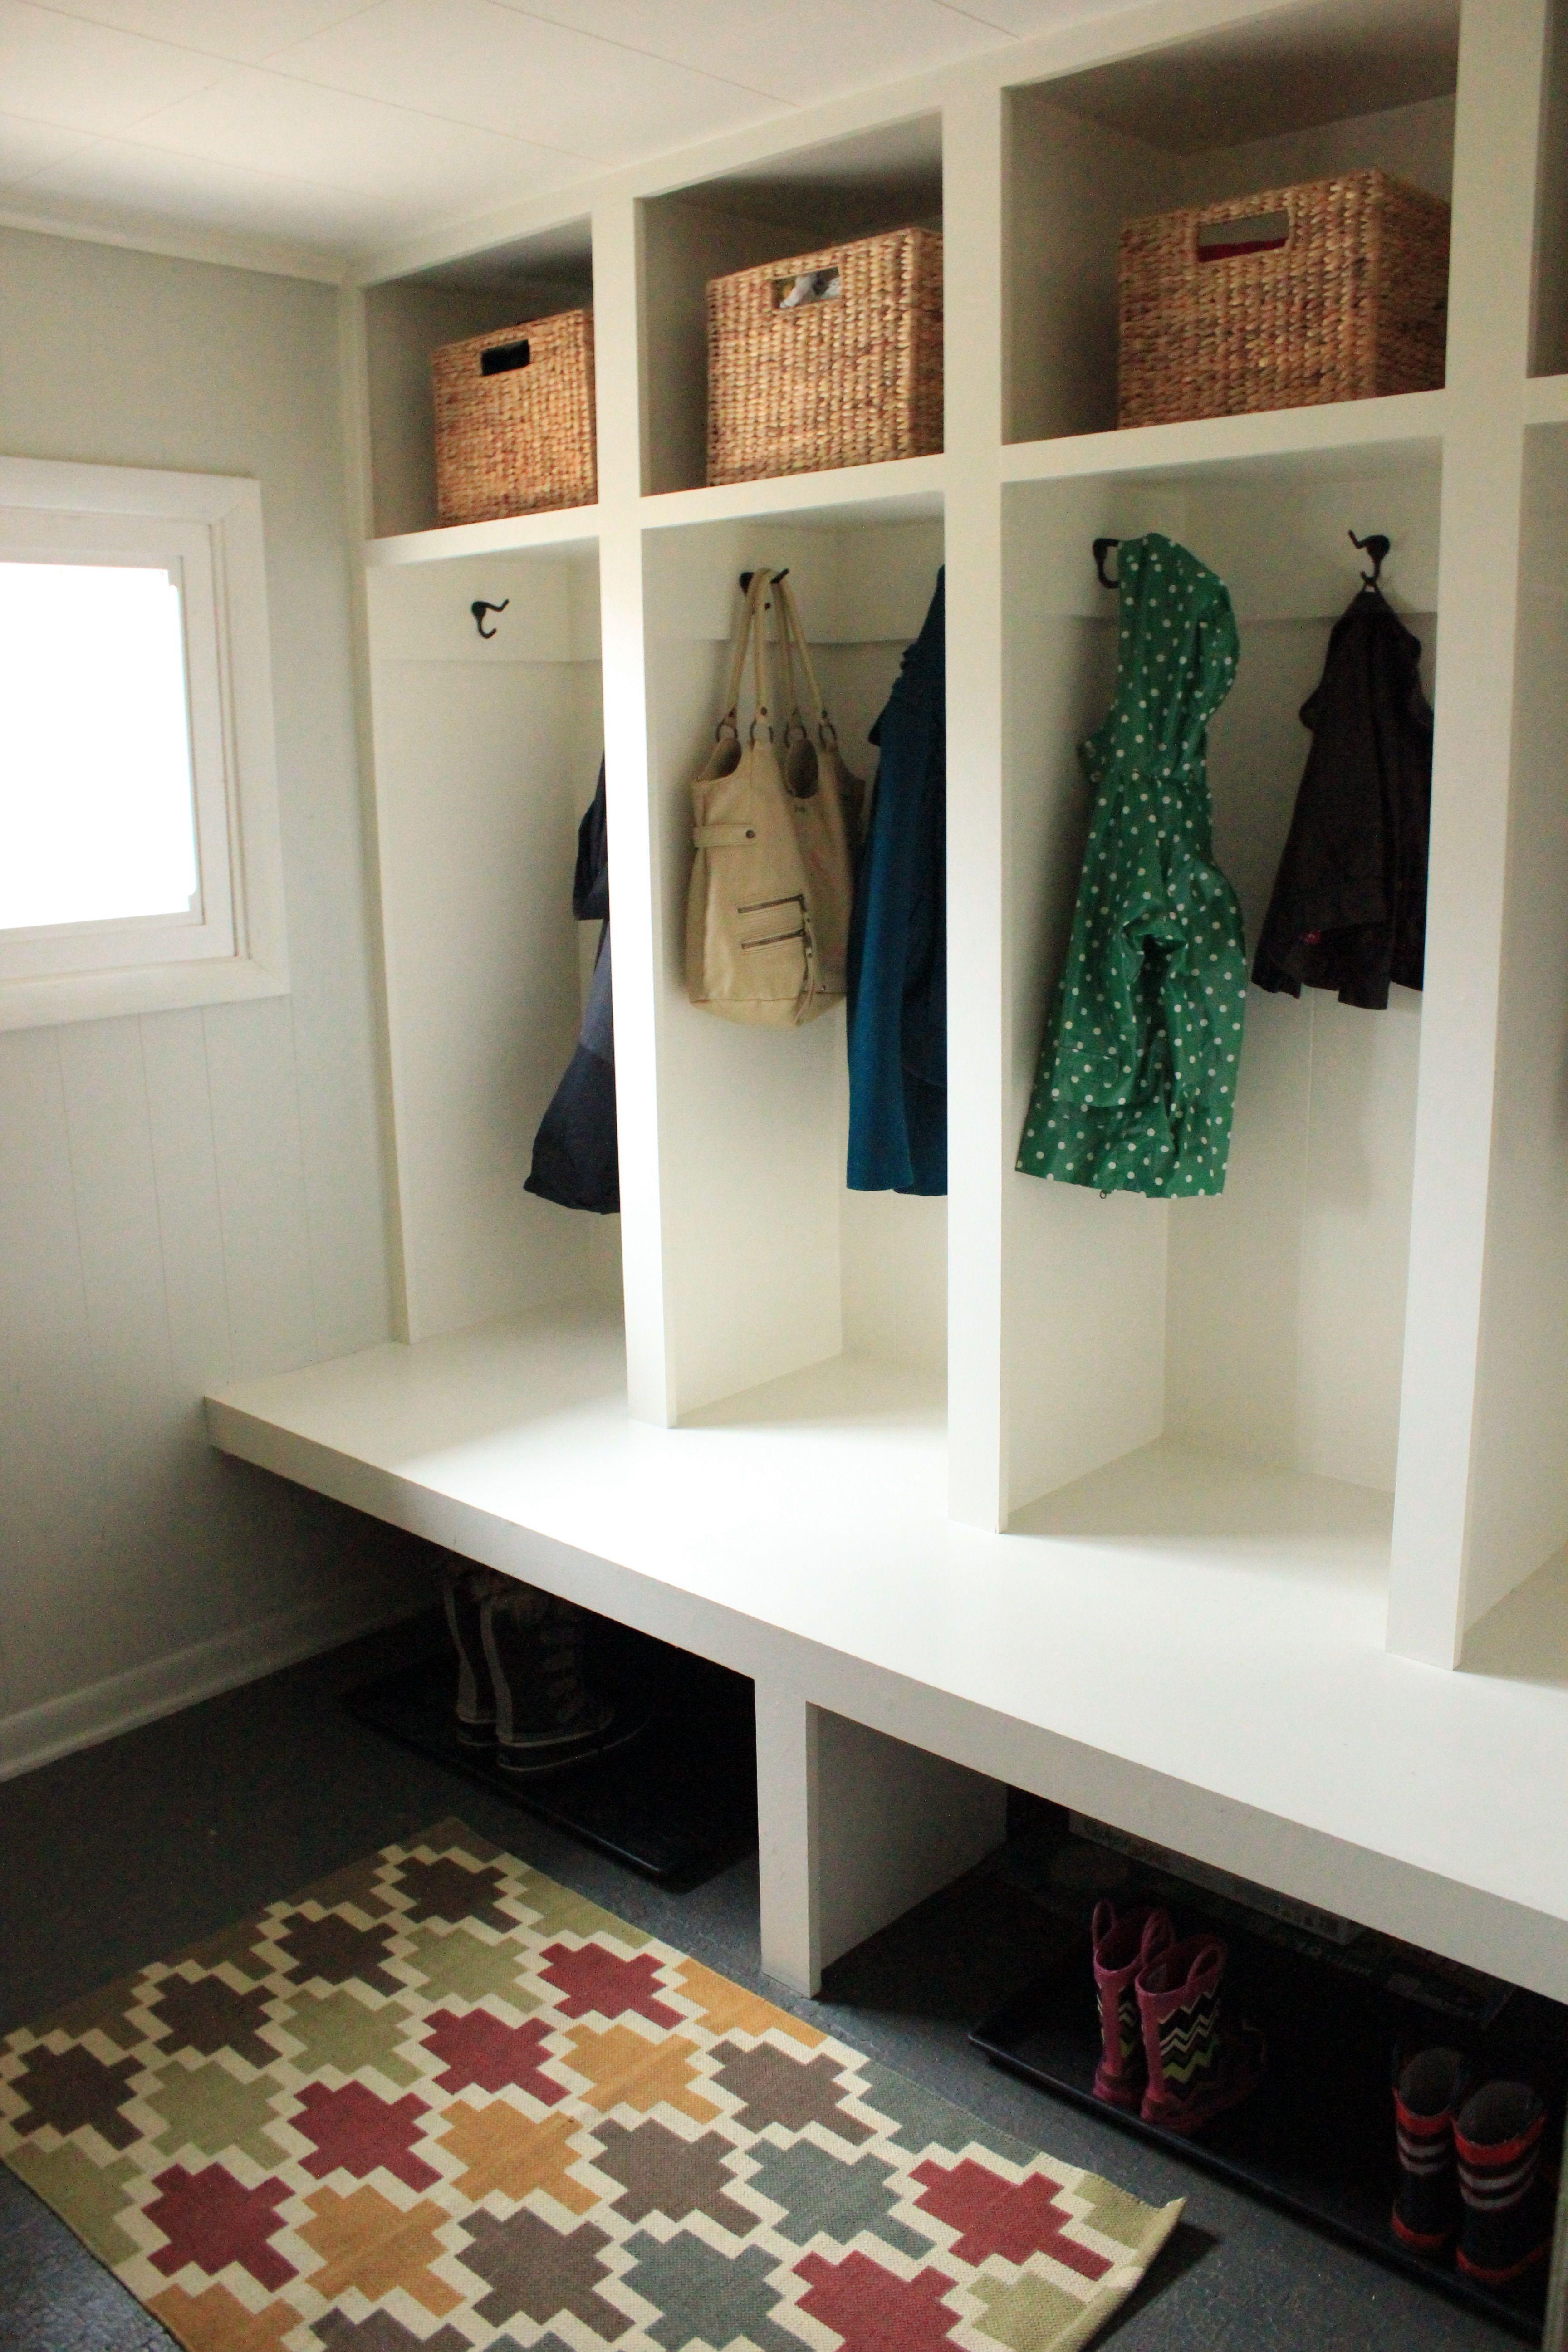 Marvelous 45 Superb Mudroom Entryway Design Ideas With Benches And Inzonedesignstudio Interior Chair Design Inzonedesignstudiocom